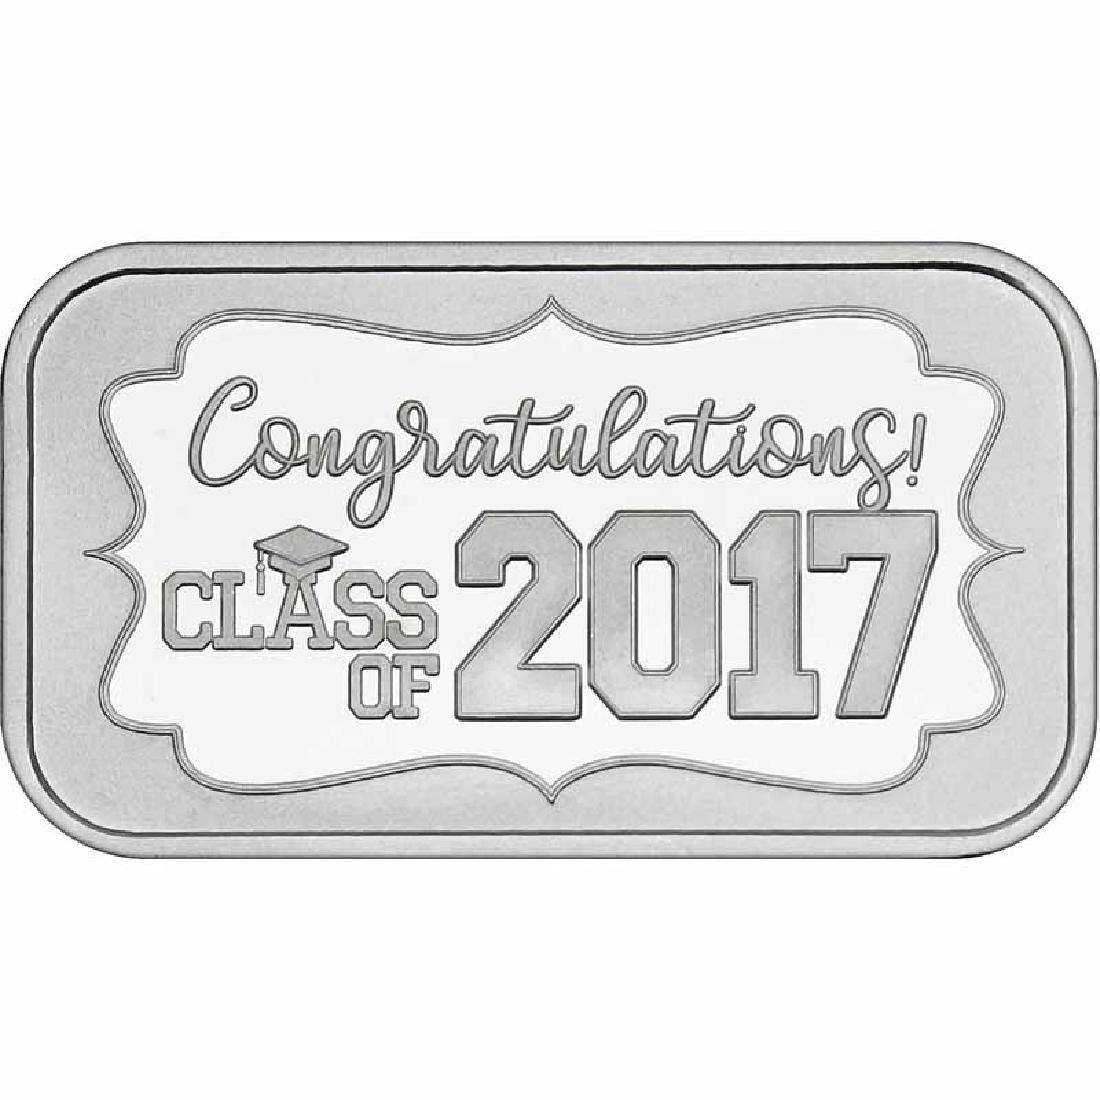 Congratulations Class Of 2017 .999 Silver 1 oz Bar